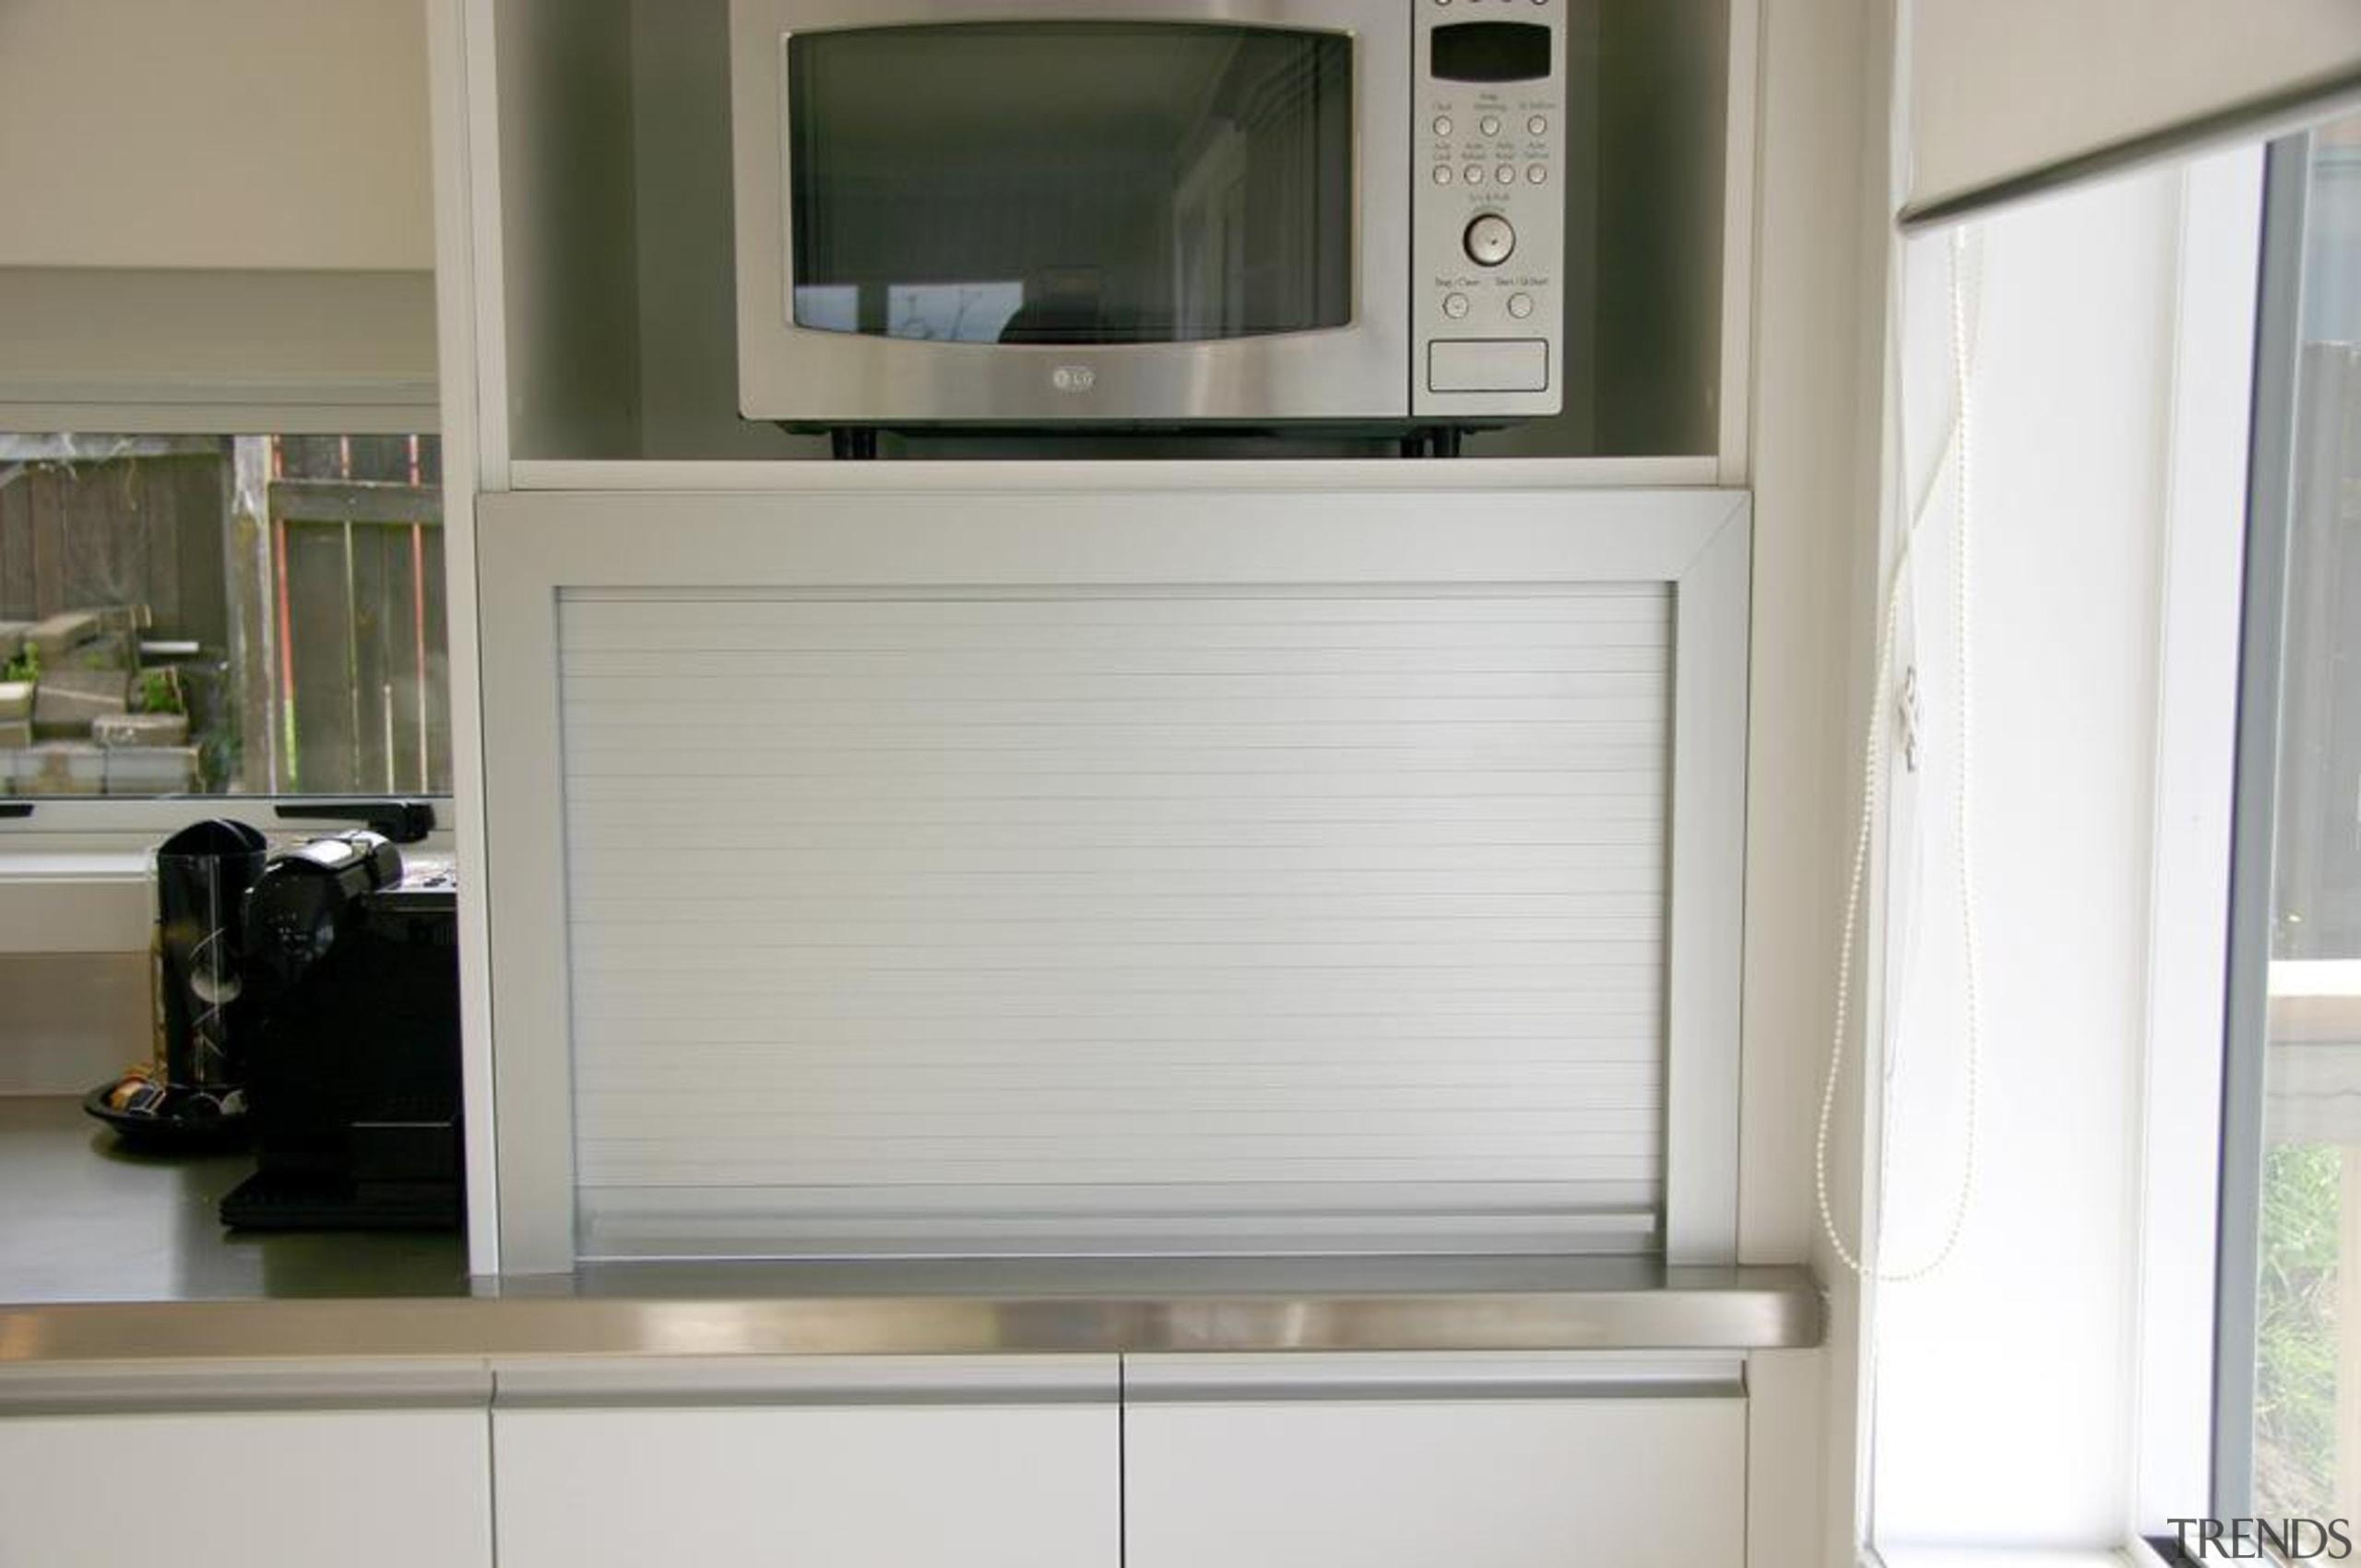 11 hillsborough modern 2013 6.jpg - 11_hillsborough_modern_2013_6.jpg - home appliance, window, gray, white